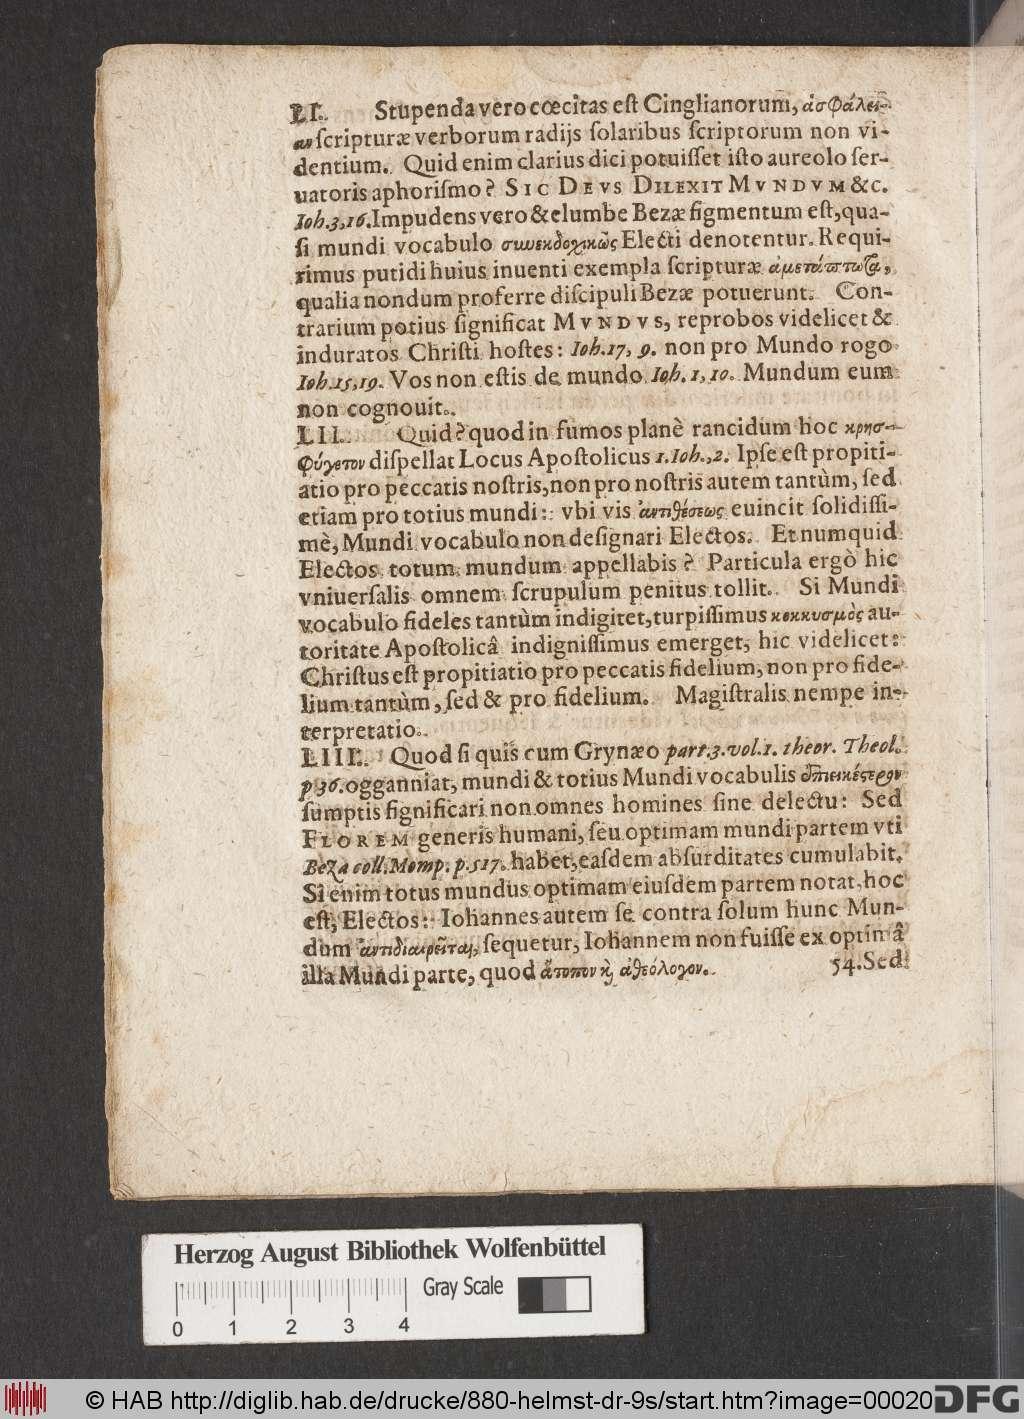 https://diglib.hab.de/drucke/880-helmst-dr-9s/00020.jpg